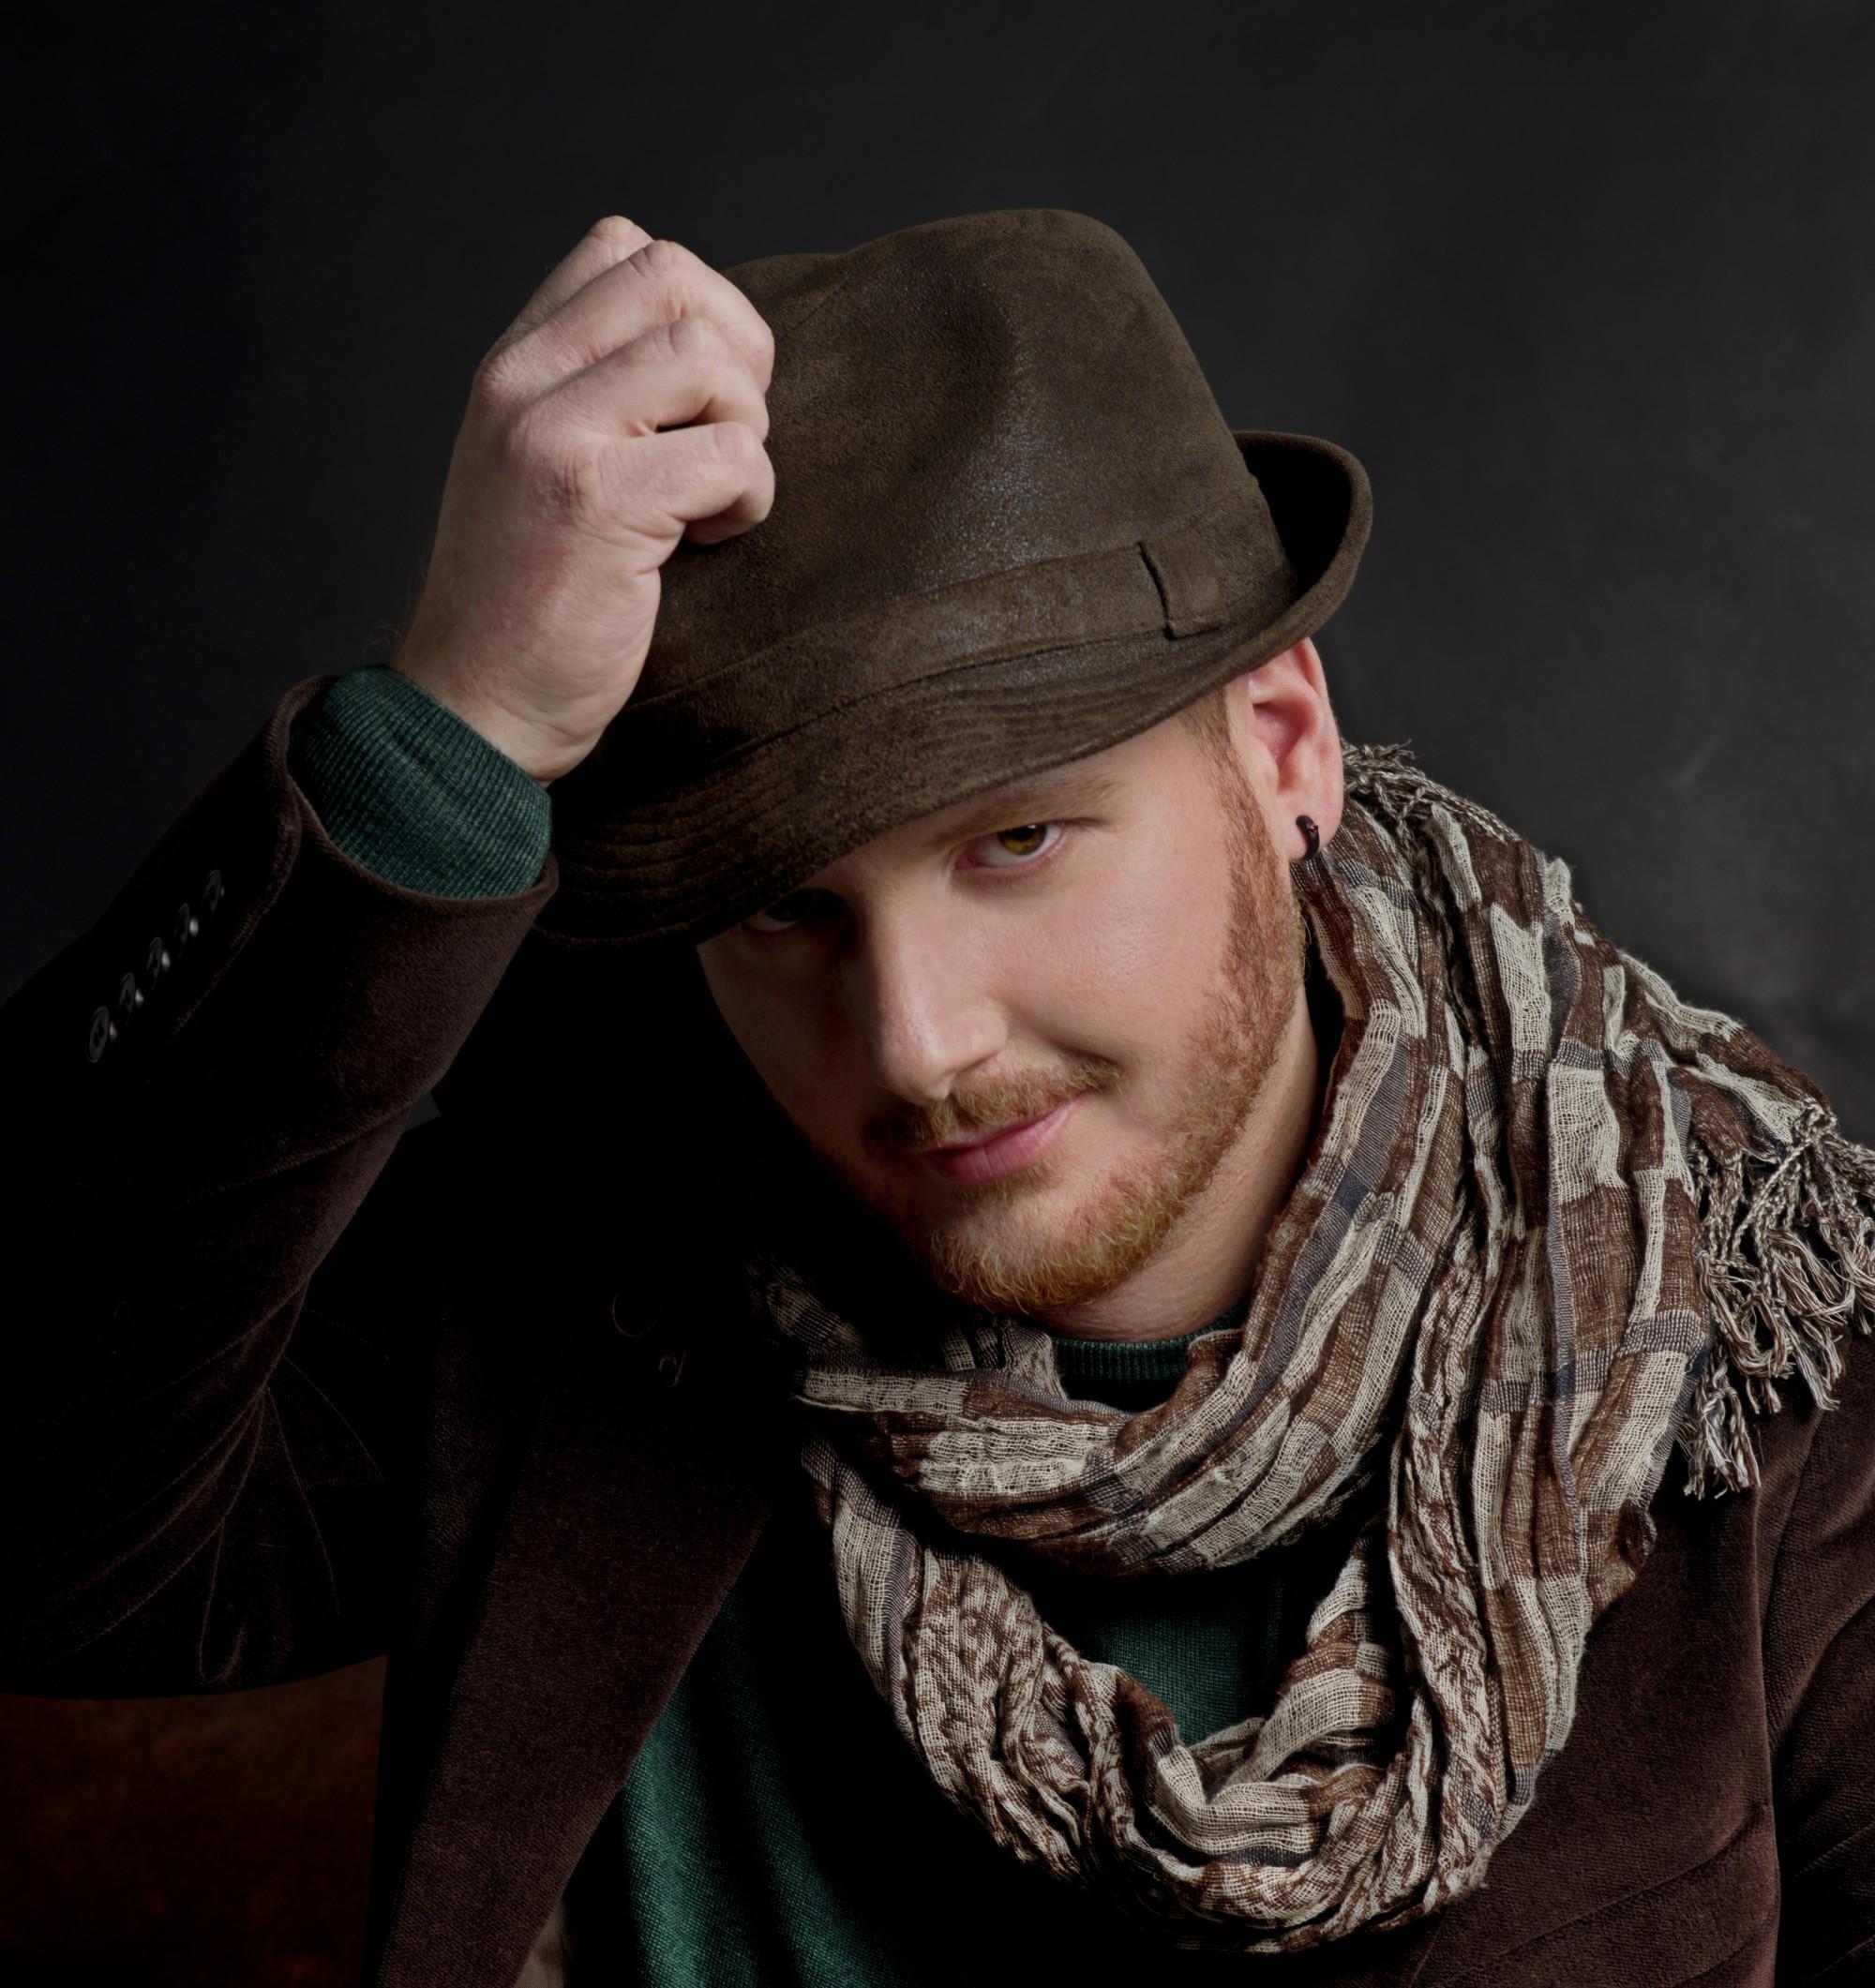 La biografia del giovane talento Francesco Spatola